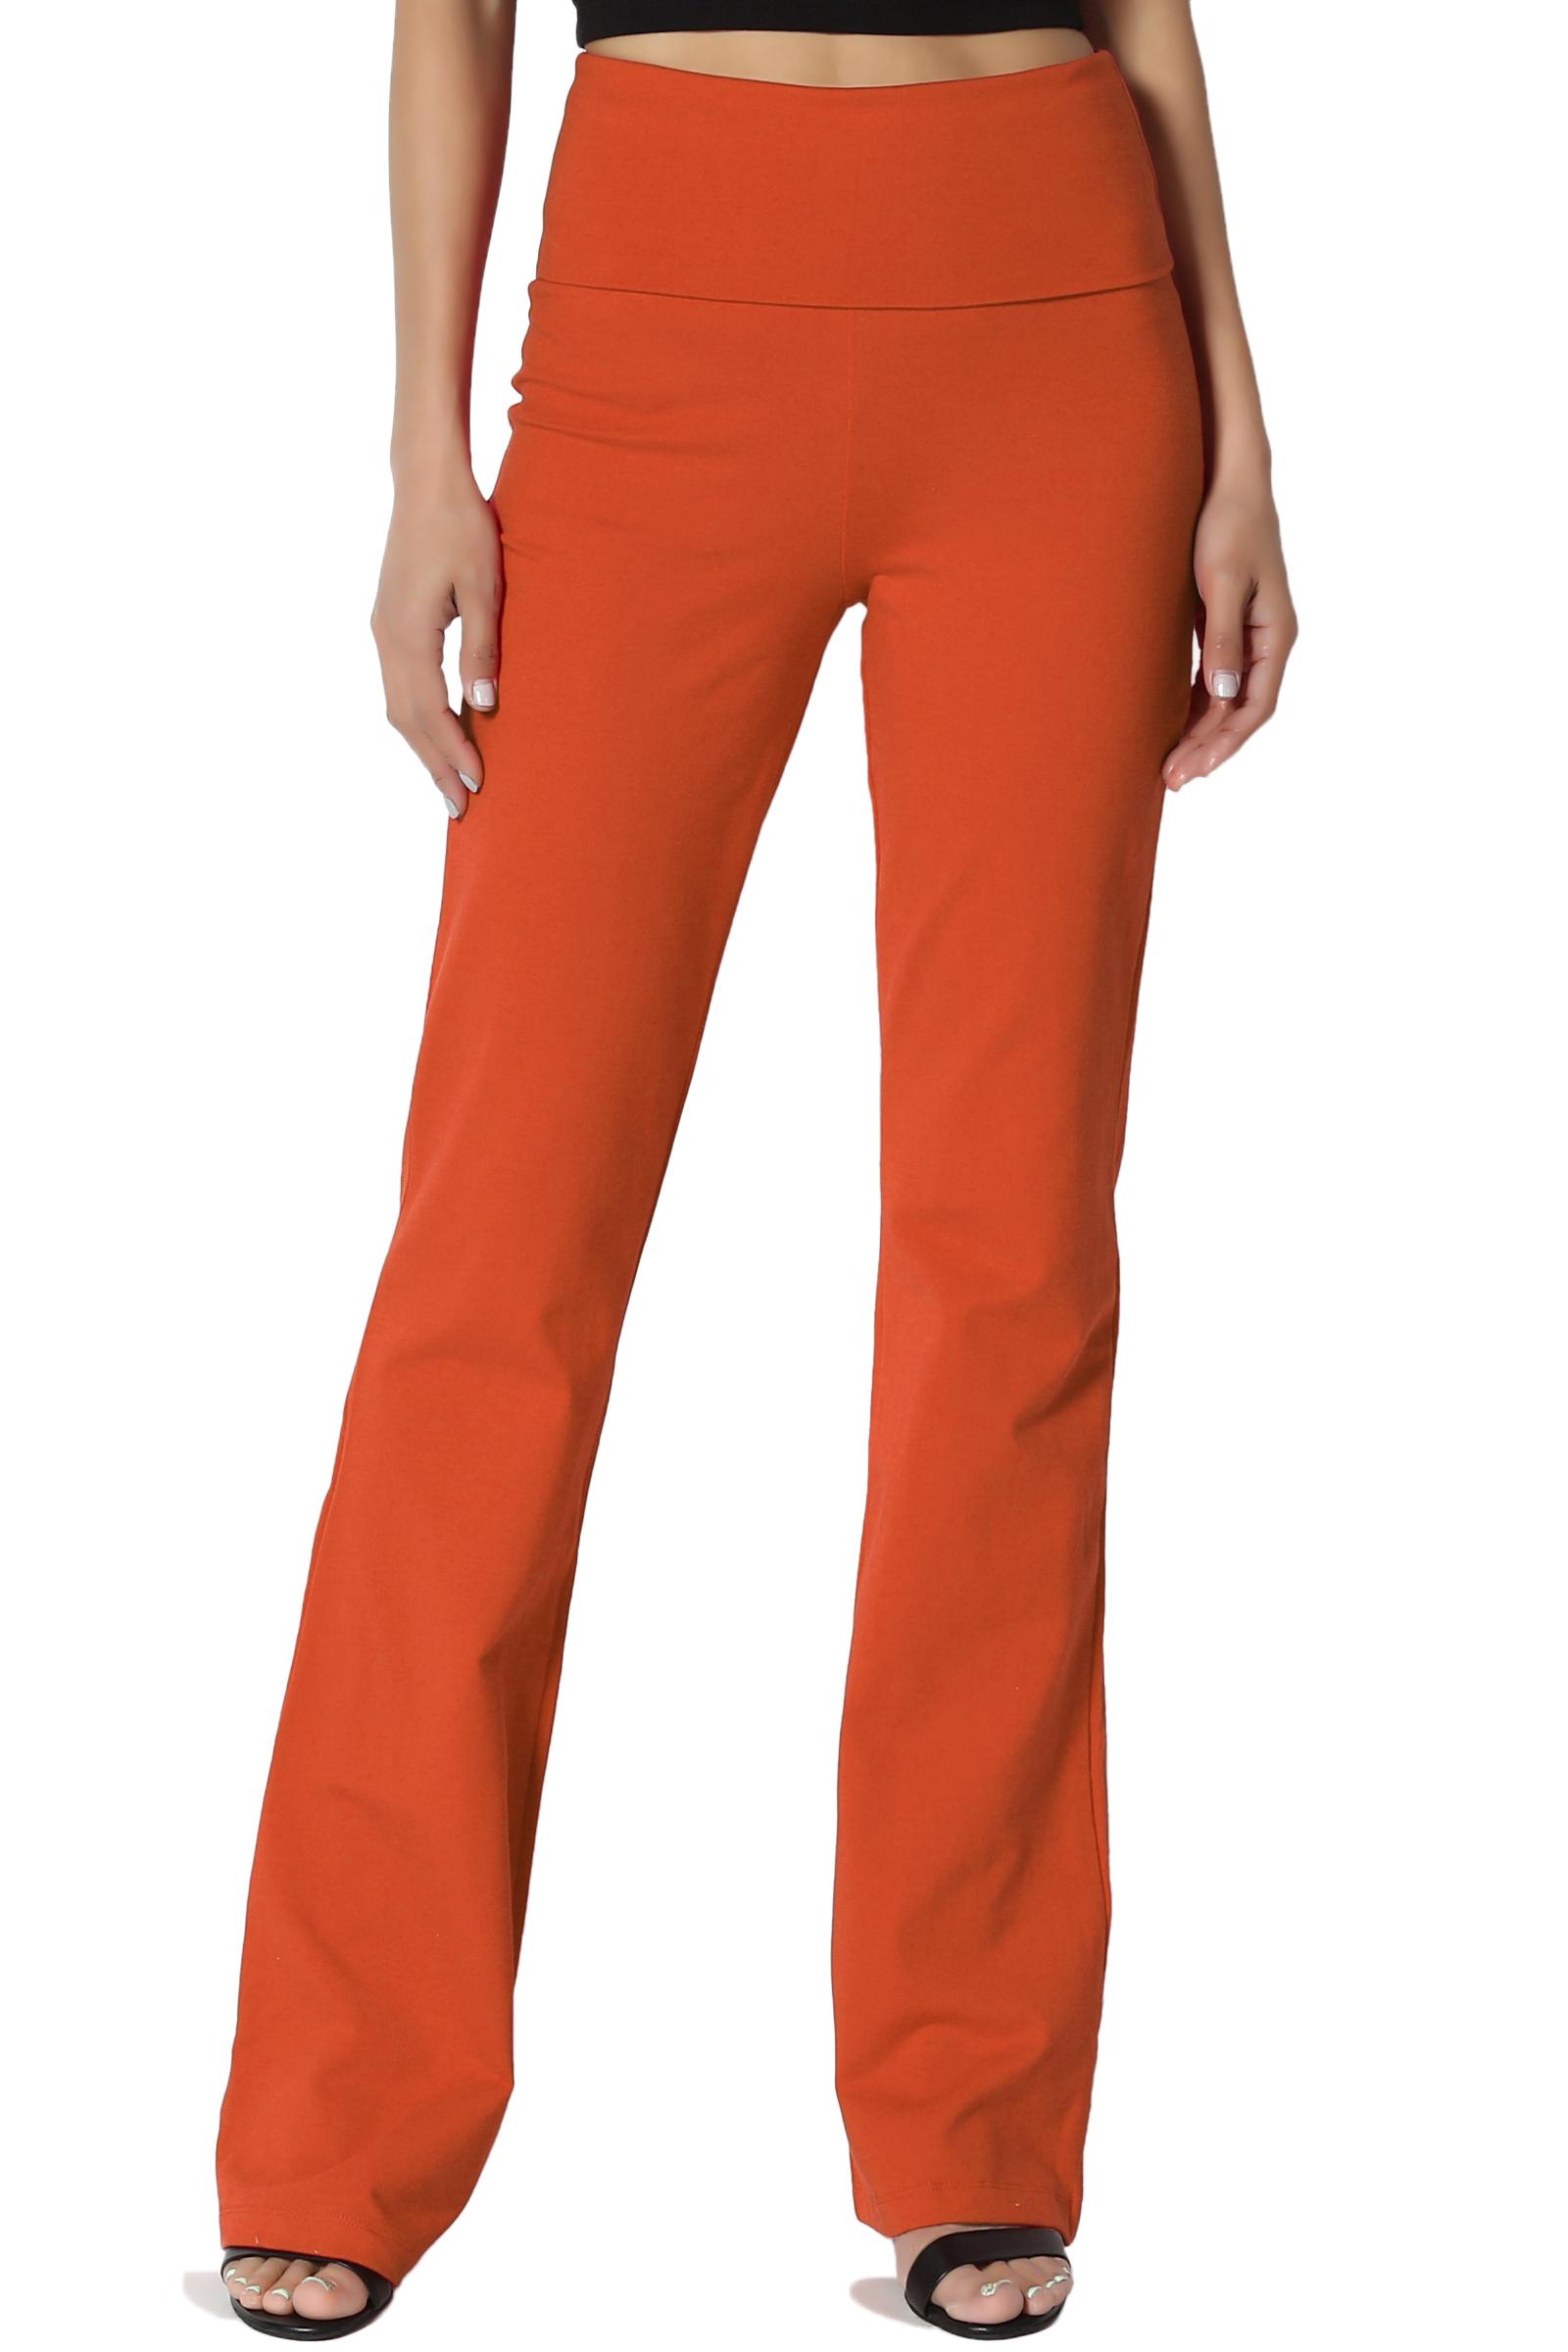 TheMogan Women's S~3X Thick Stretch Cotton Foldover Waist Bootcut Yoga Pants